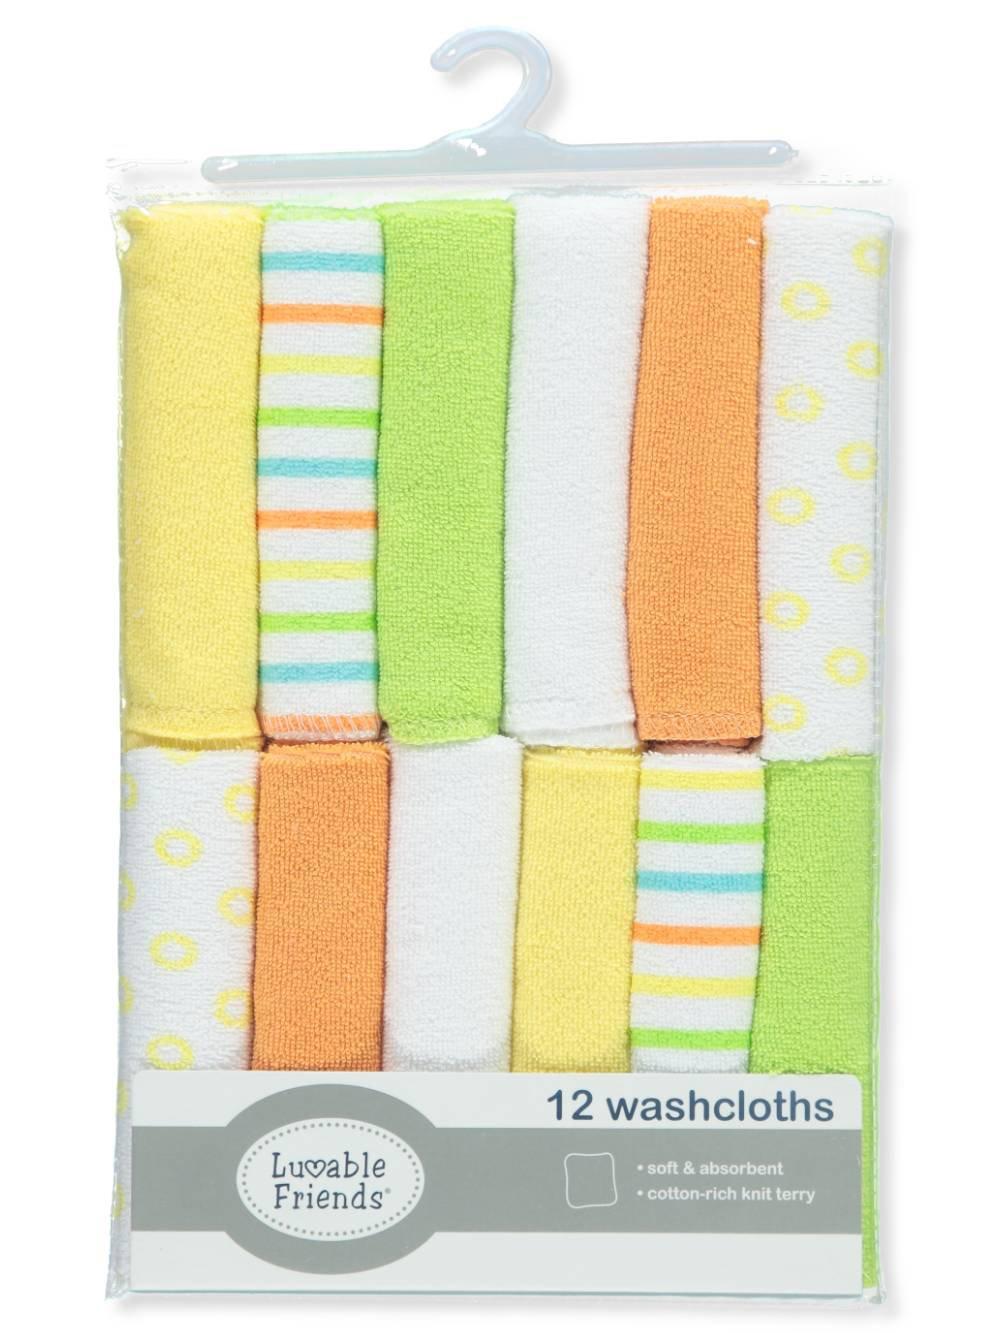 Amazon.com: Luvable Friends - 12 paños de lavado, diseño de ...